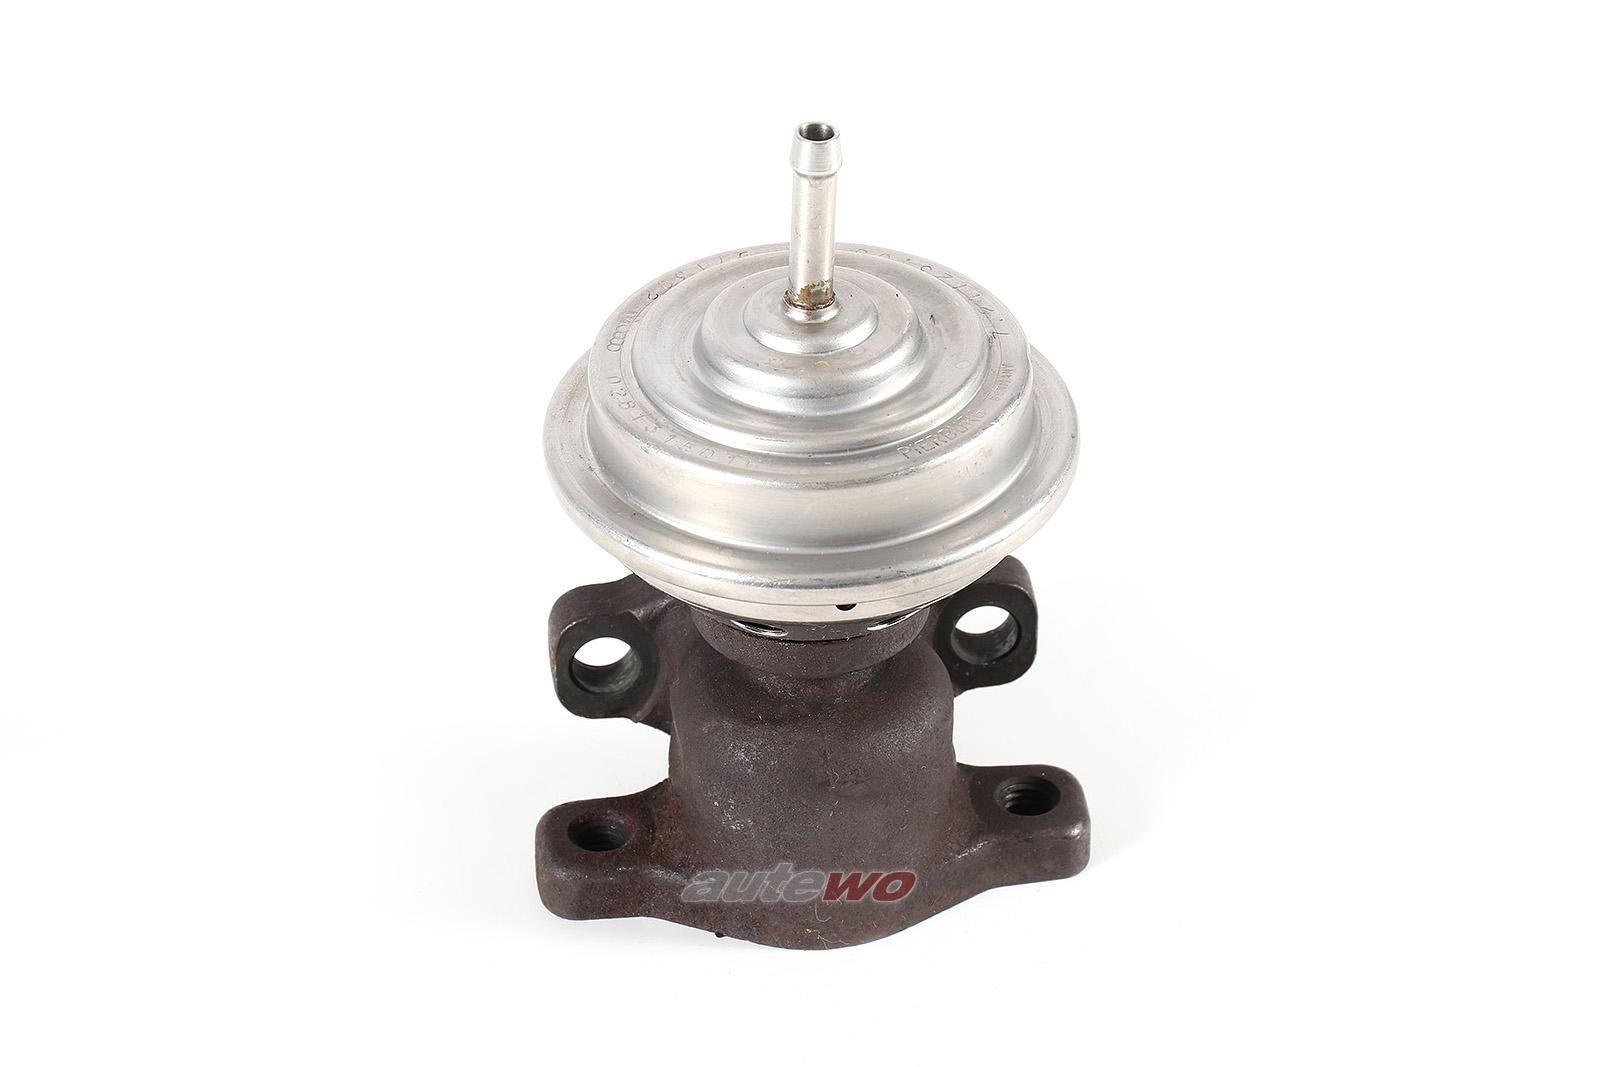 028131501E Audi/VW/Seat 80 B4/Cabrio Typ 89/A4 B5/A6 C4/4B 1.9l TDI AGR-Ventil